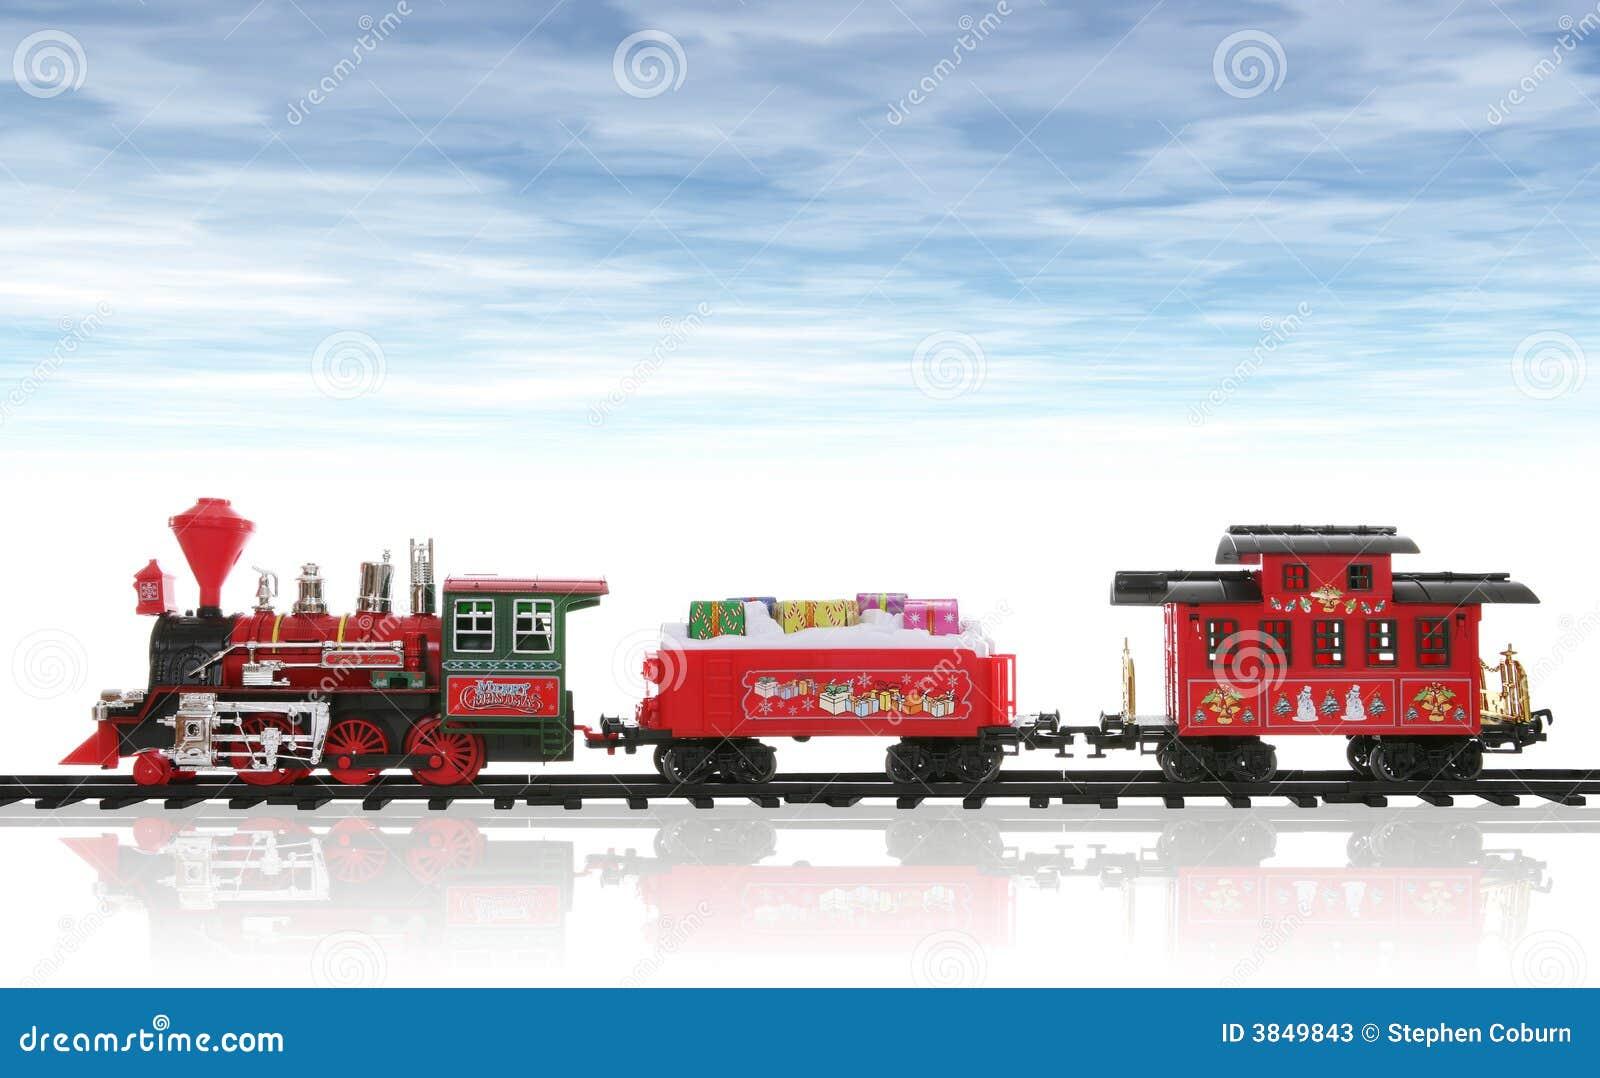 tren de la navidad imagen de archivo imagen de regalo toy train clipart christmas toy train clipart